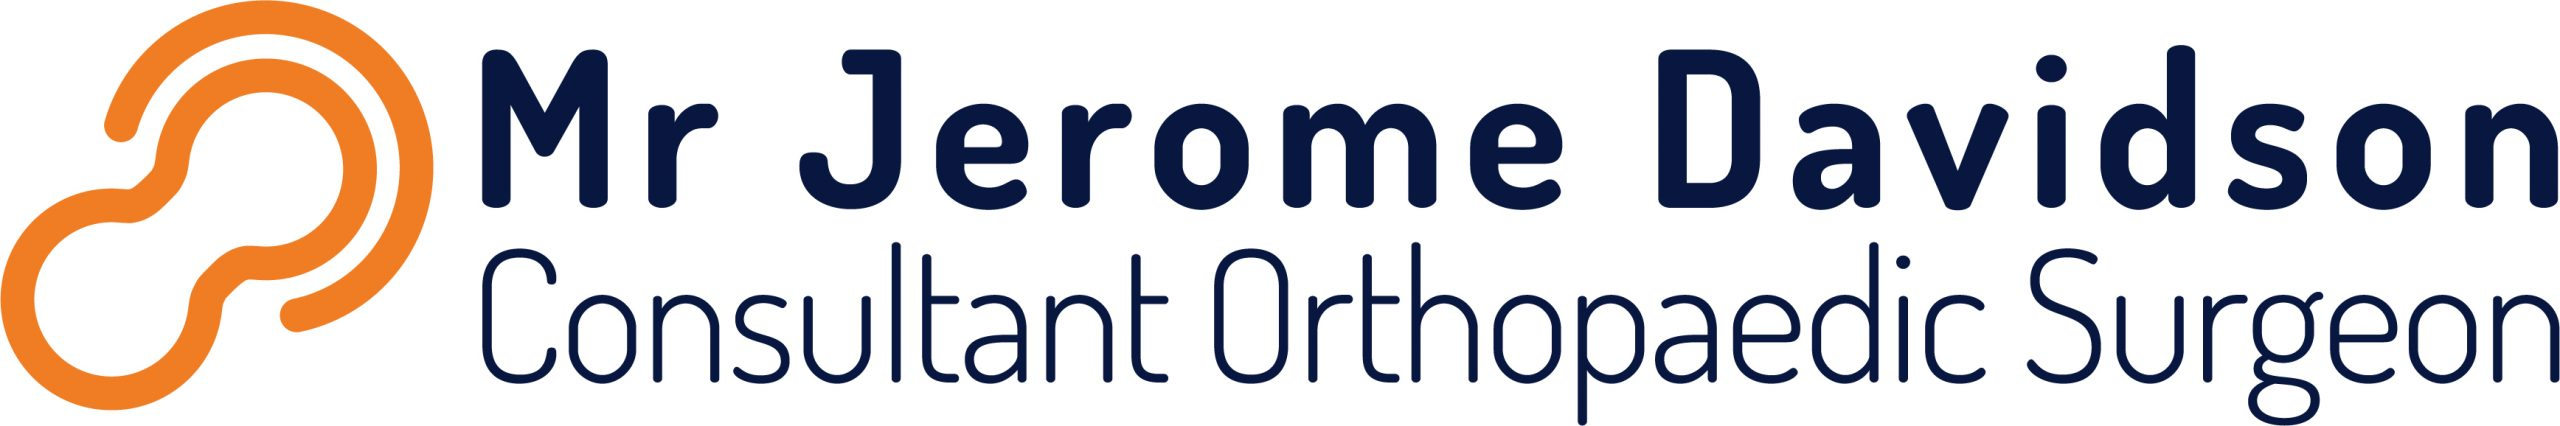 Mr Jerome Davidson | Consultant Orthopaedic Surgeon